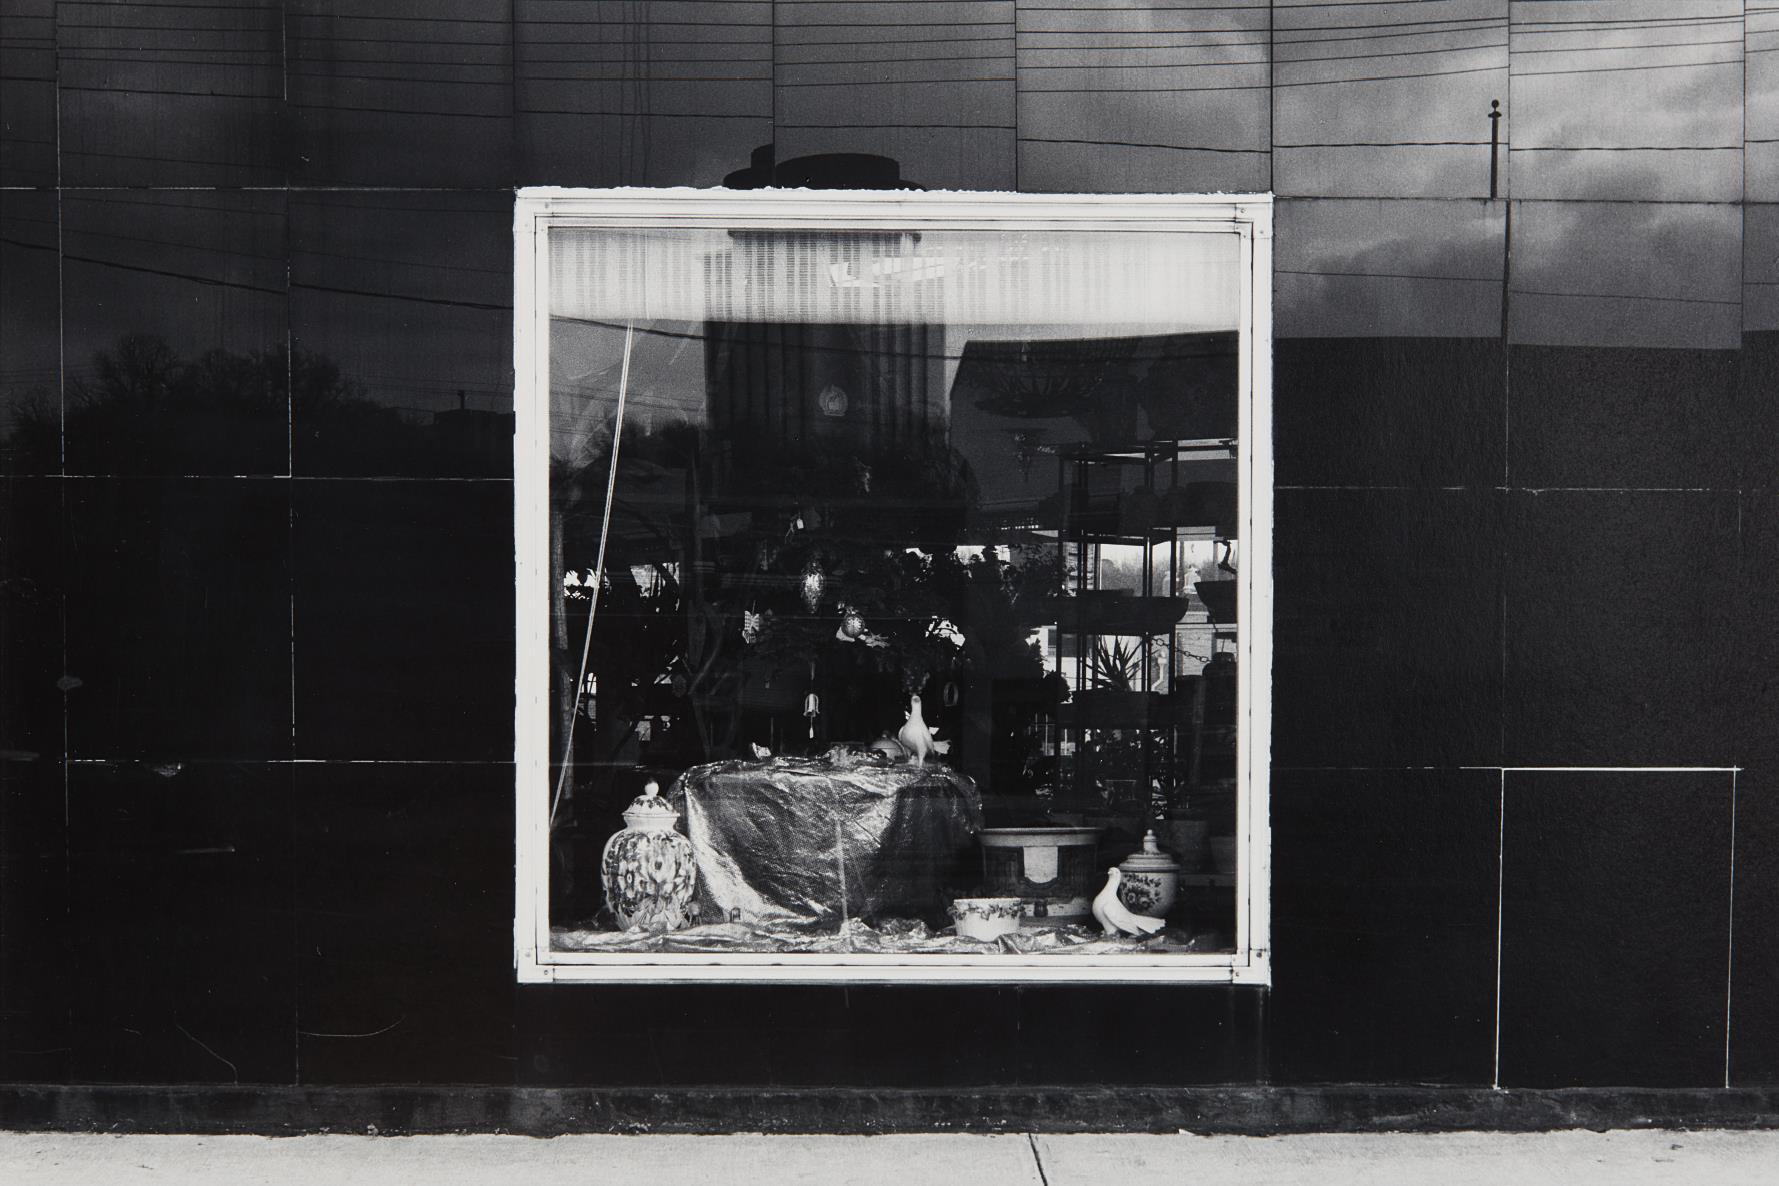 Lewis Baltz-Columbia, South Carolina-1973